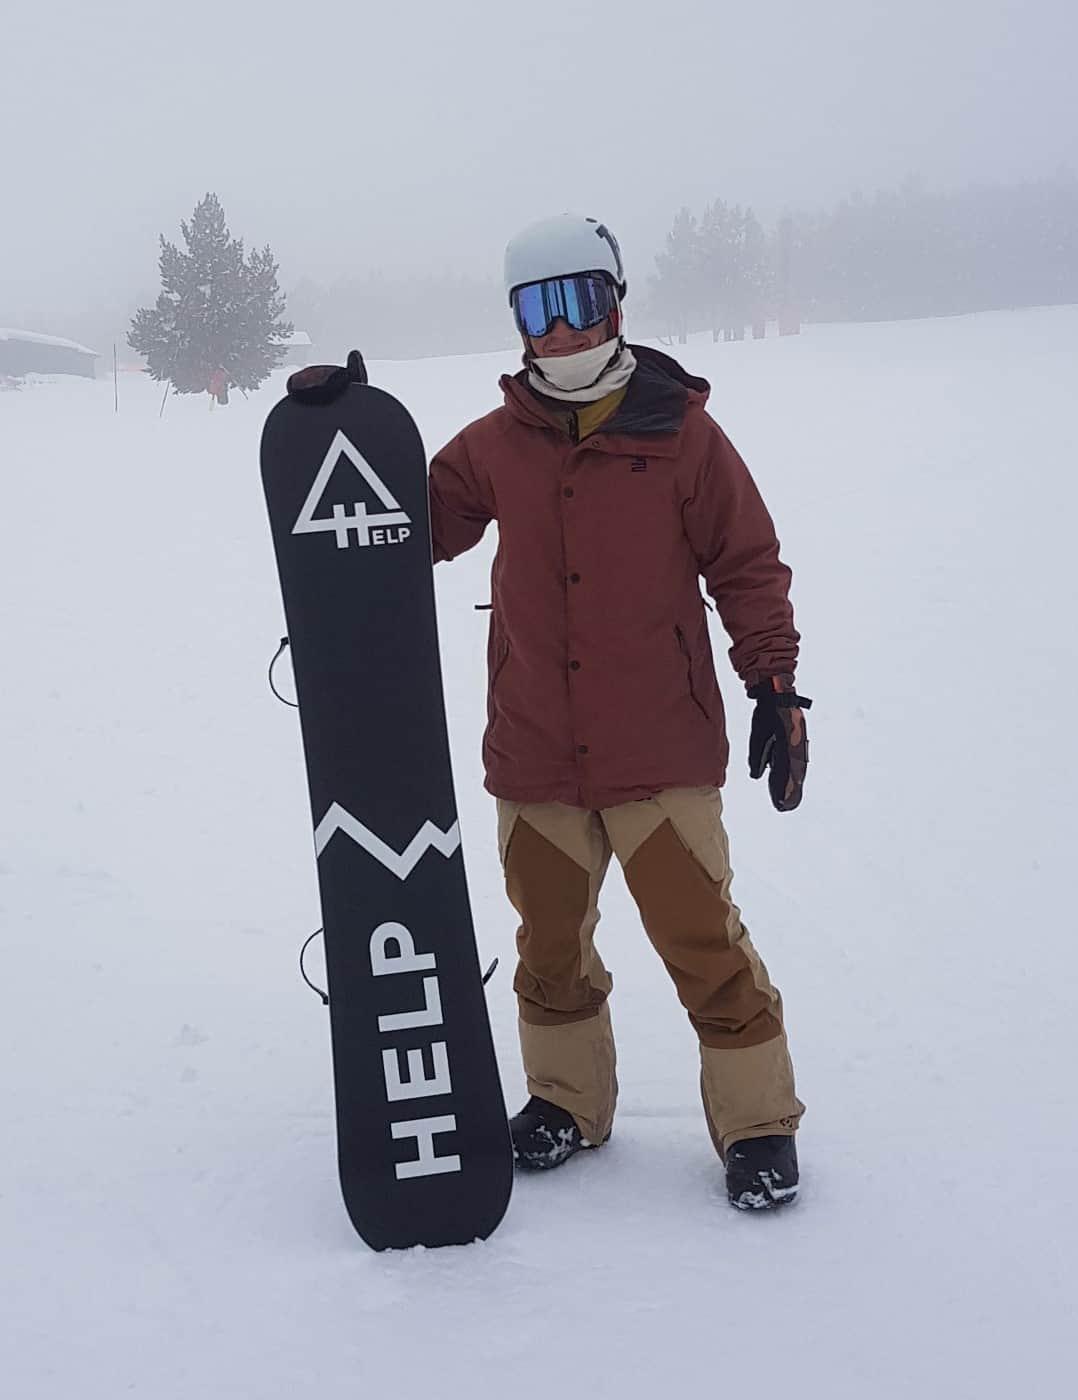 Riders españoles snowboard Pau Bartolo